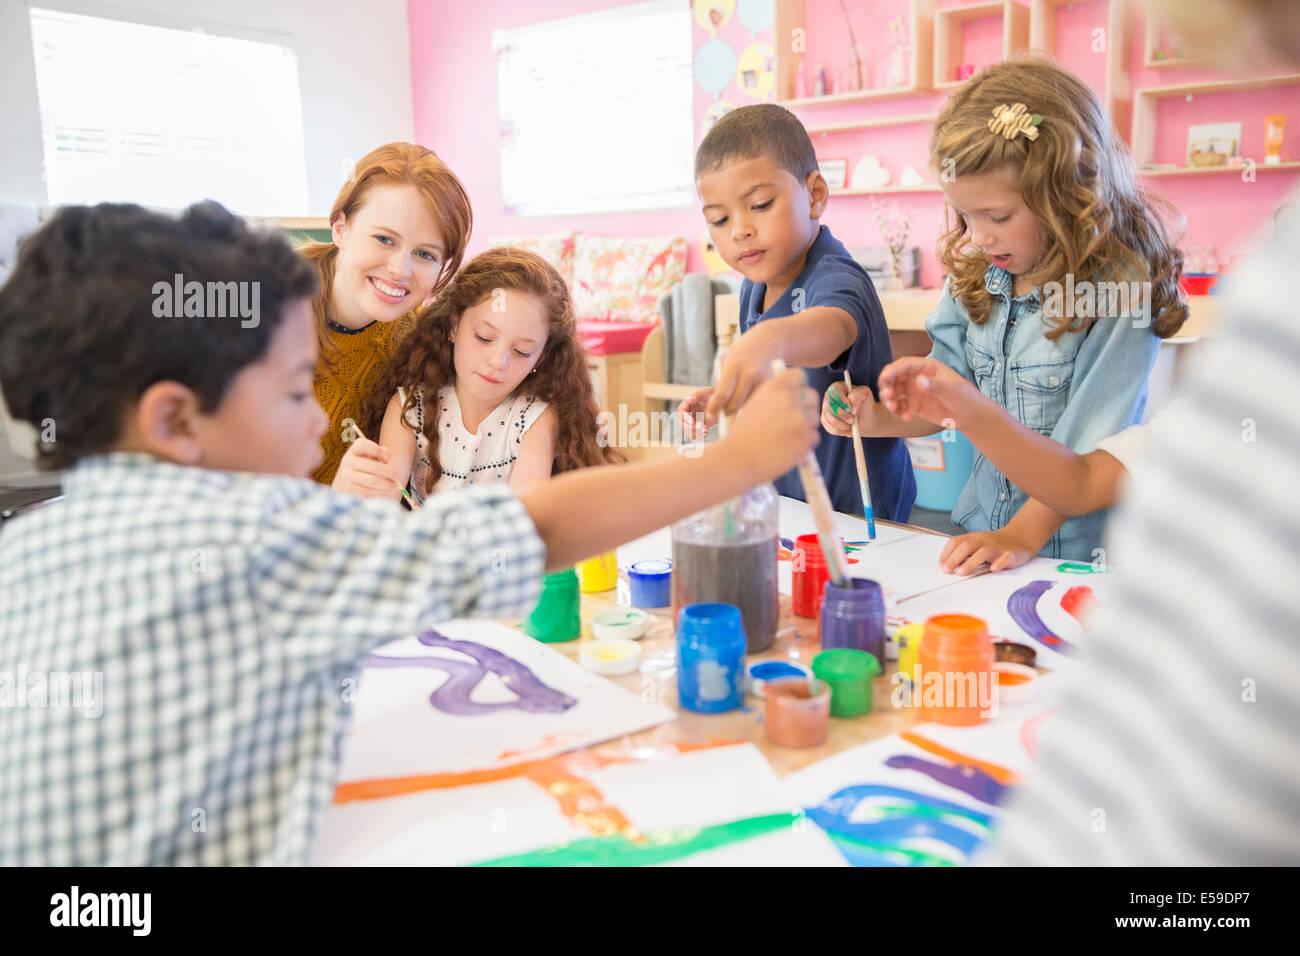 Pittura di studenti in classe Immagini Stock